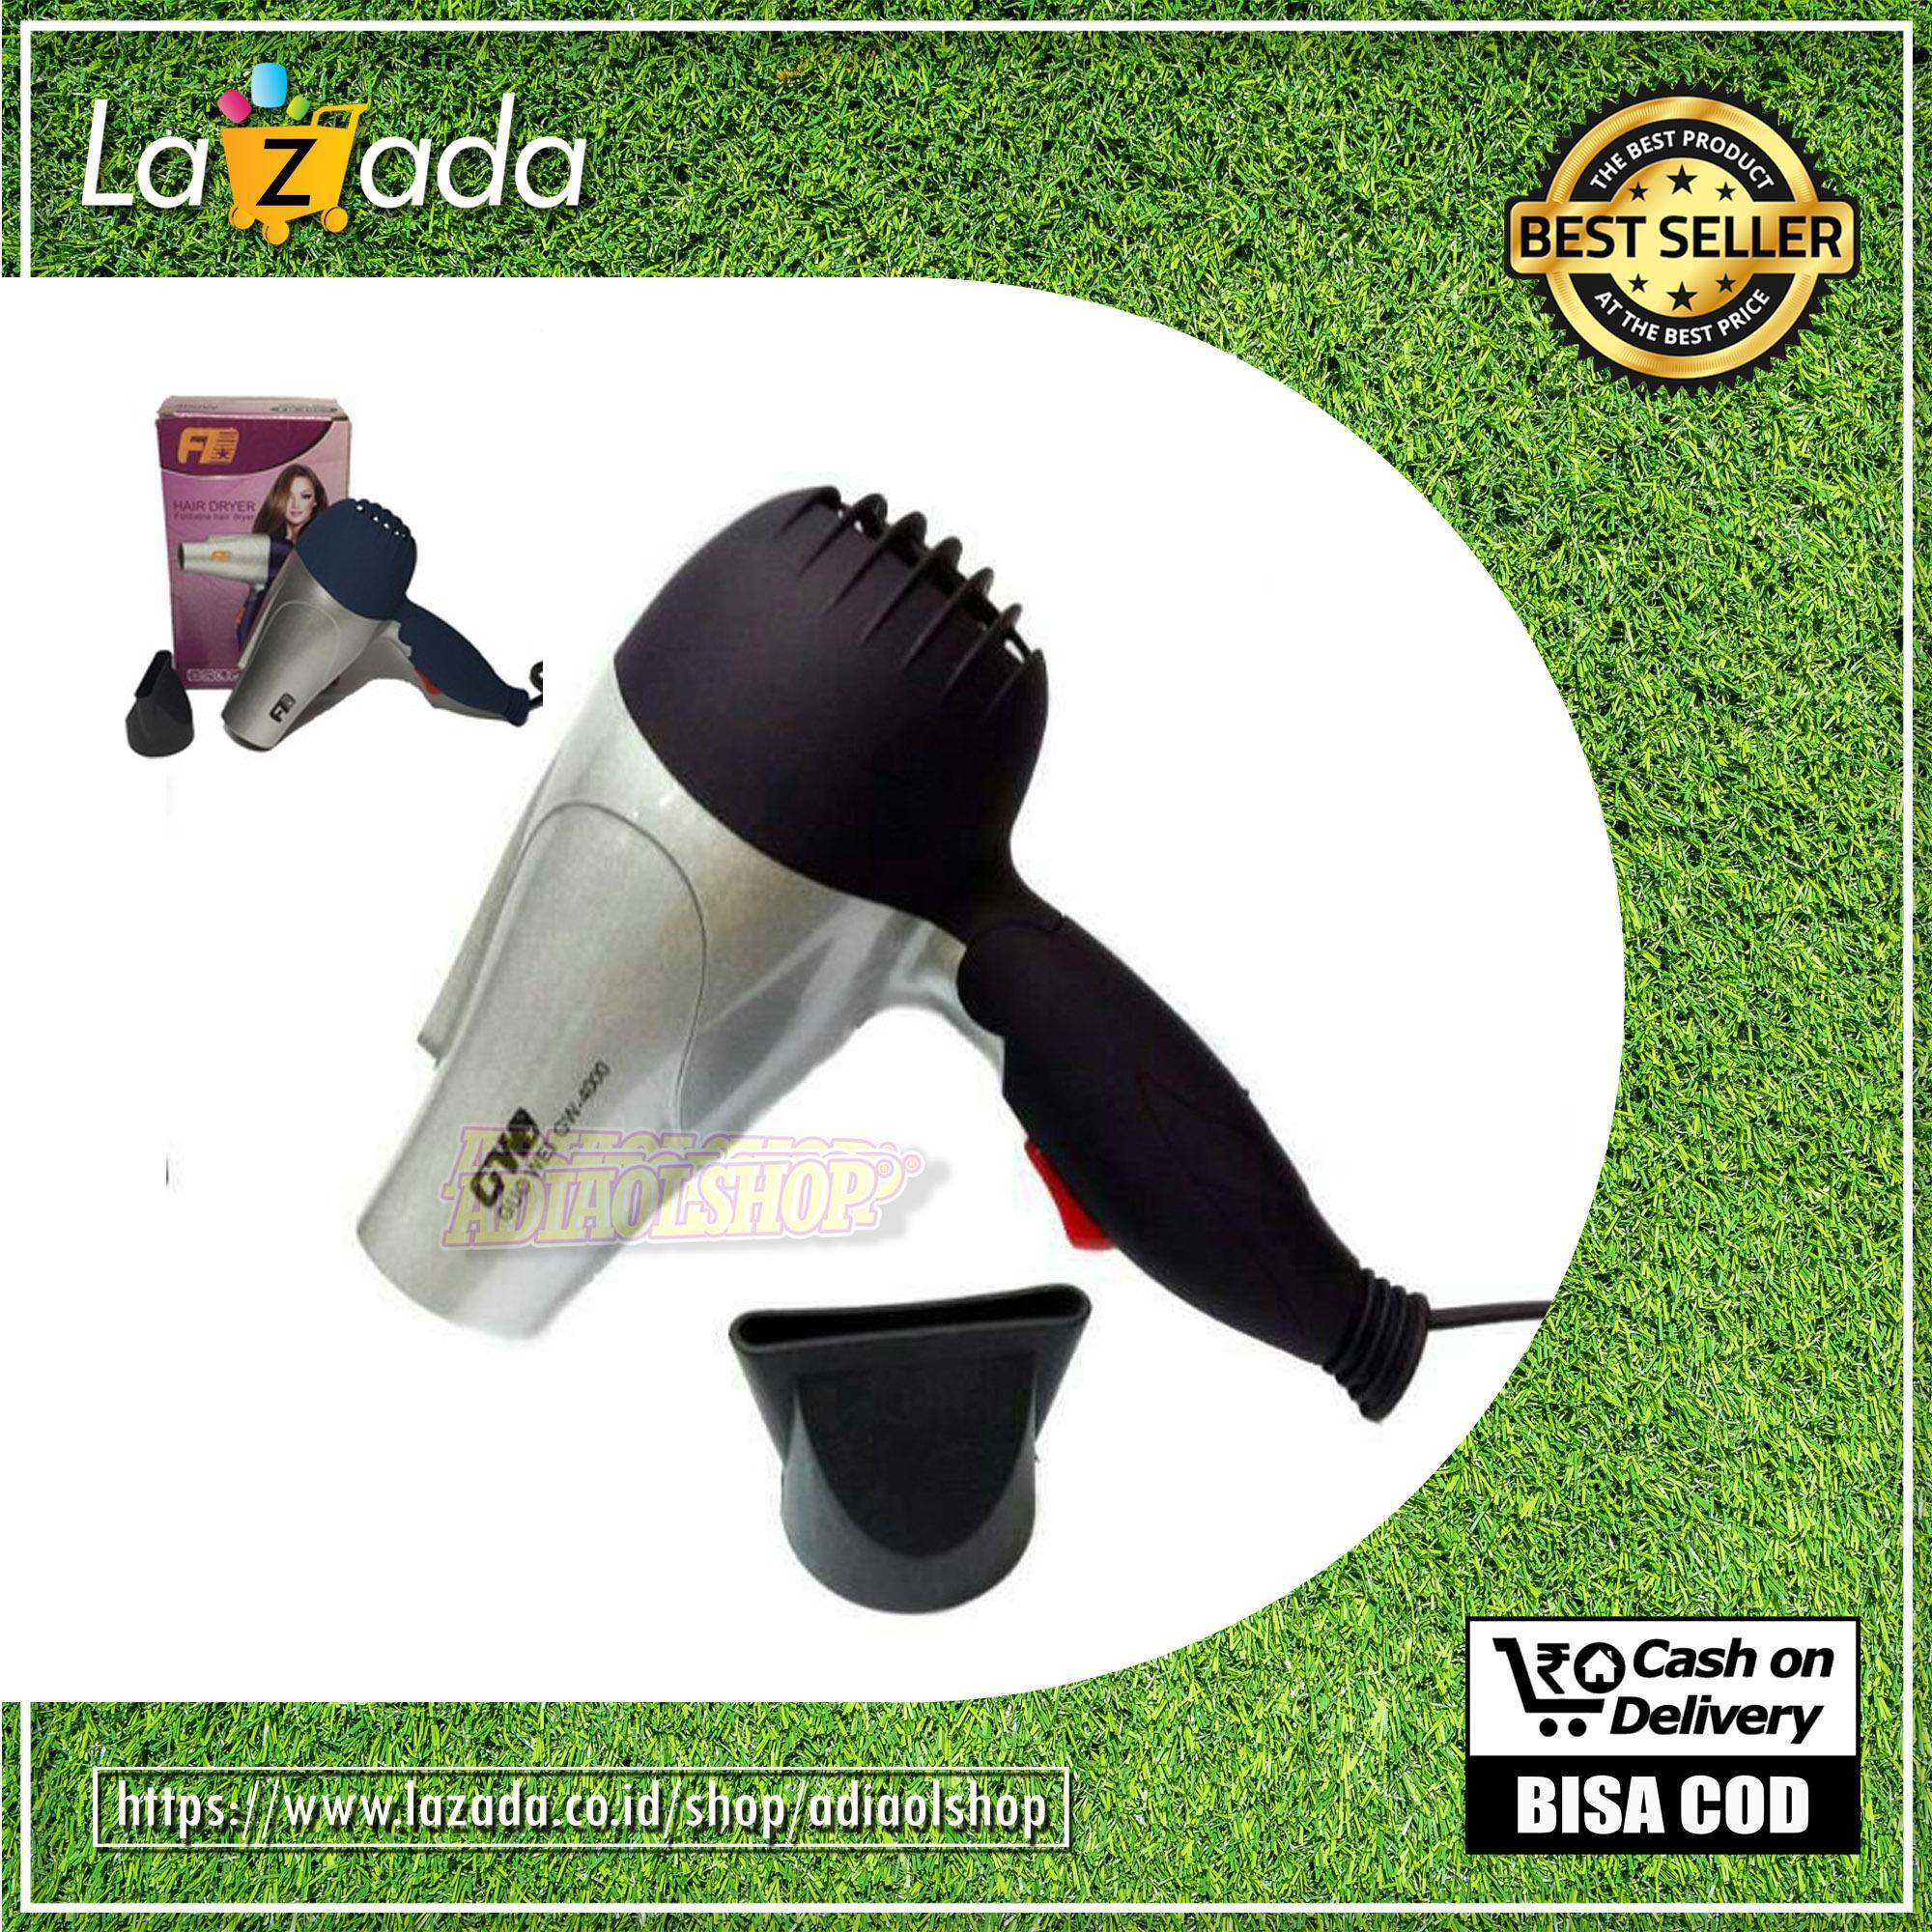 Bisa Cod - Ready Stock Hairdryer Lipat Gw-4000 - Random By Adiaolshop.